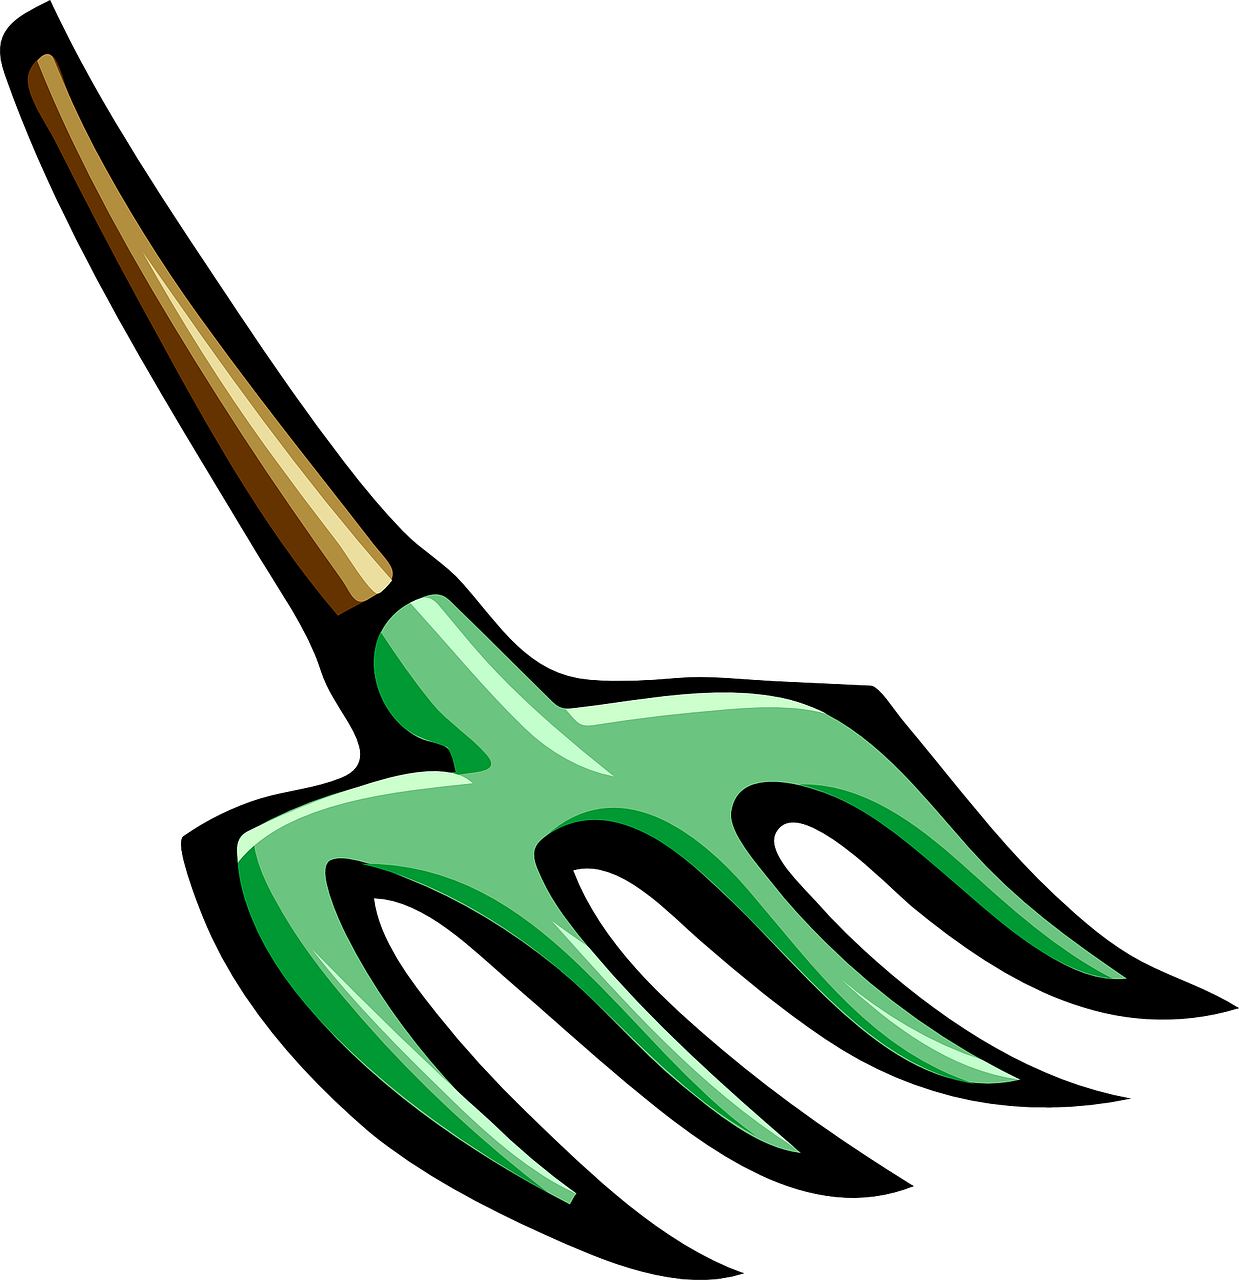 Pitch garden tool planting. Farm clipart fork